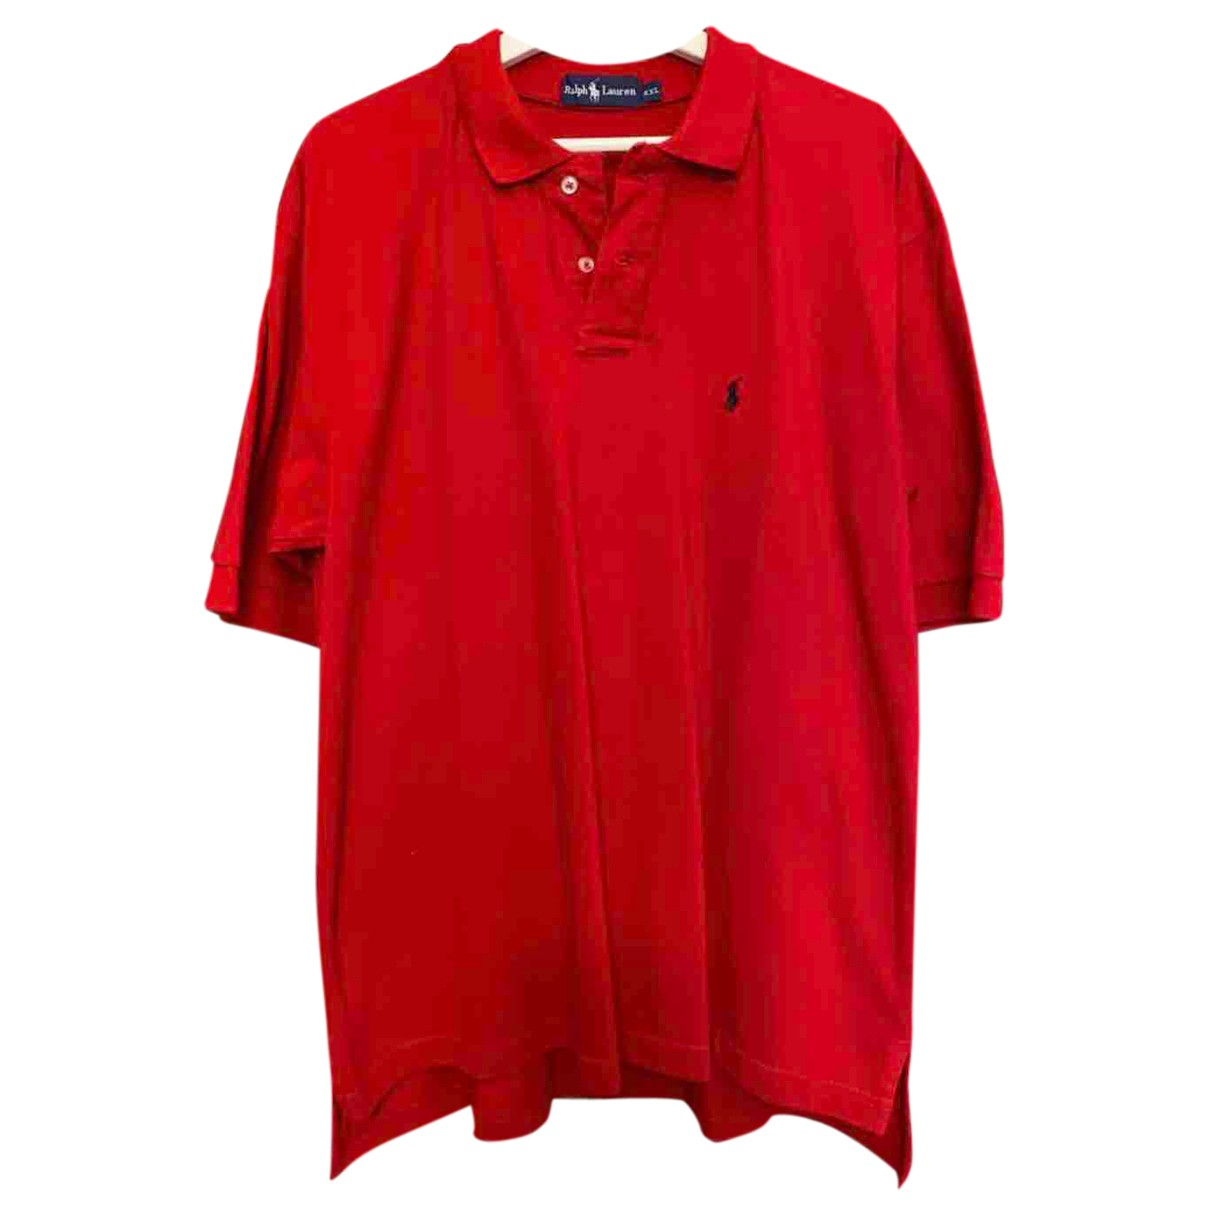 Ralph Lauren N Red Cotton Polo shirts for Men XXL International